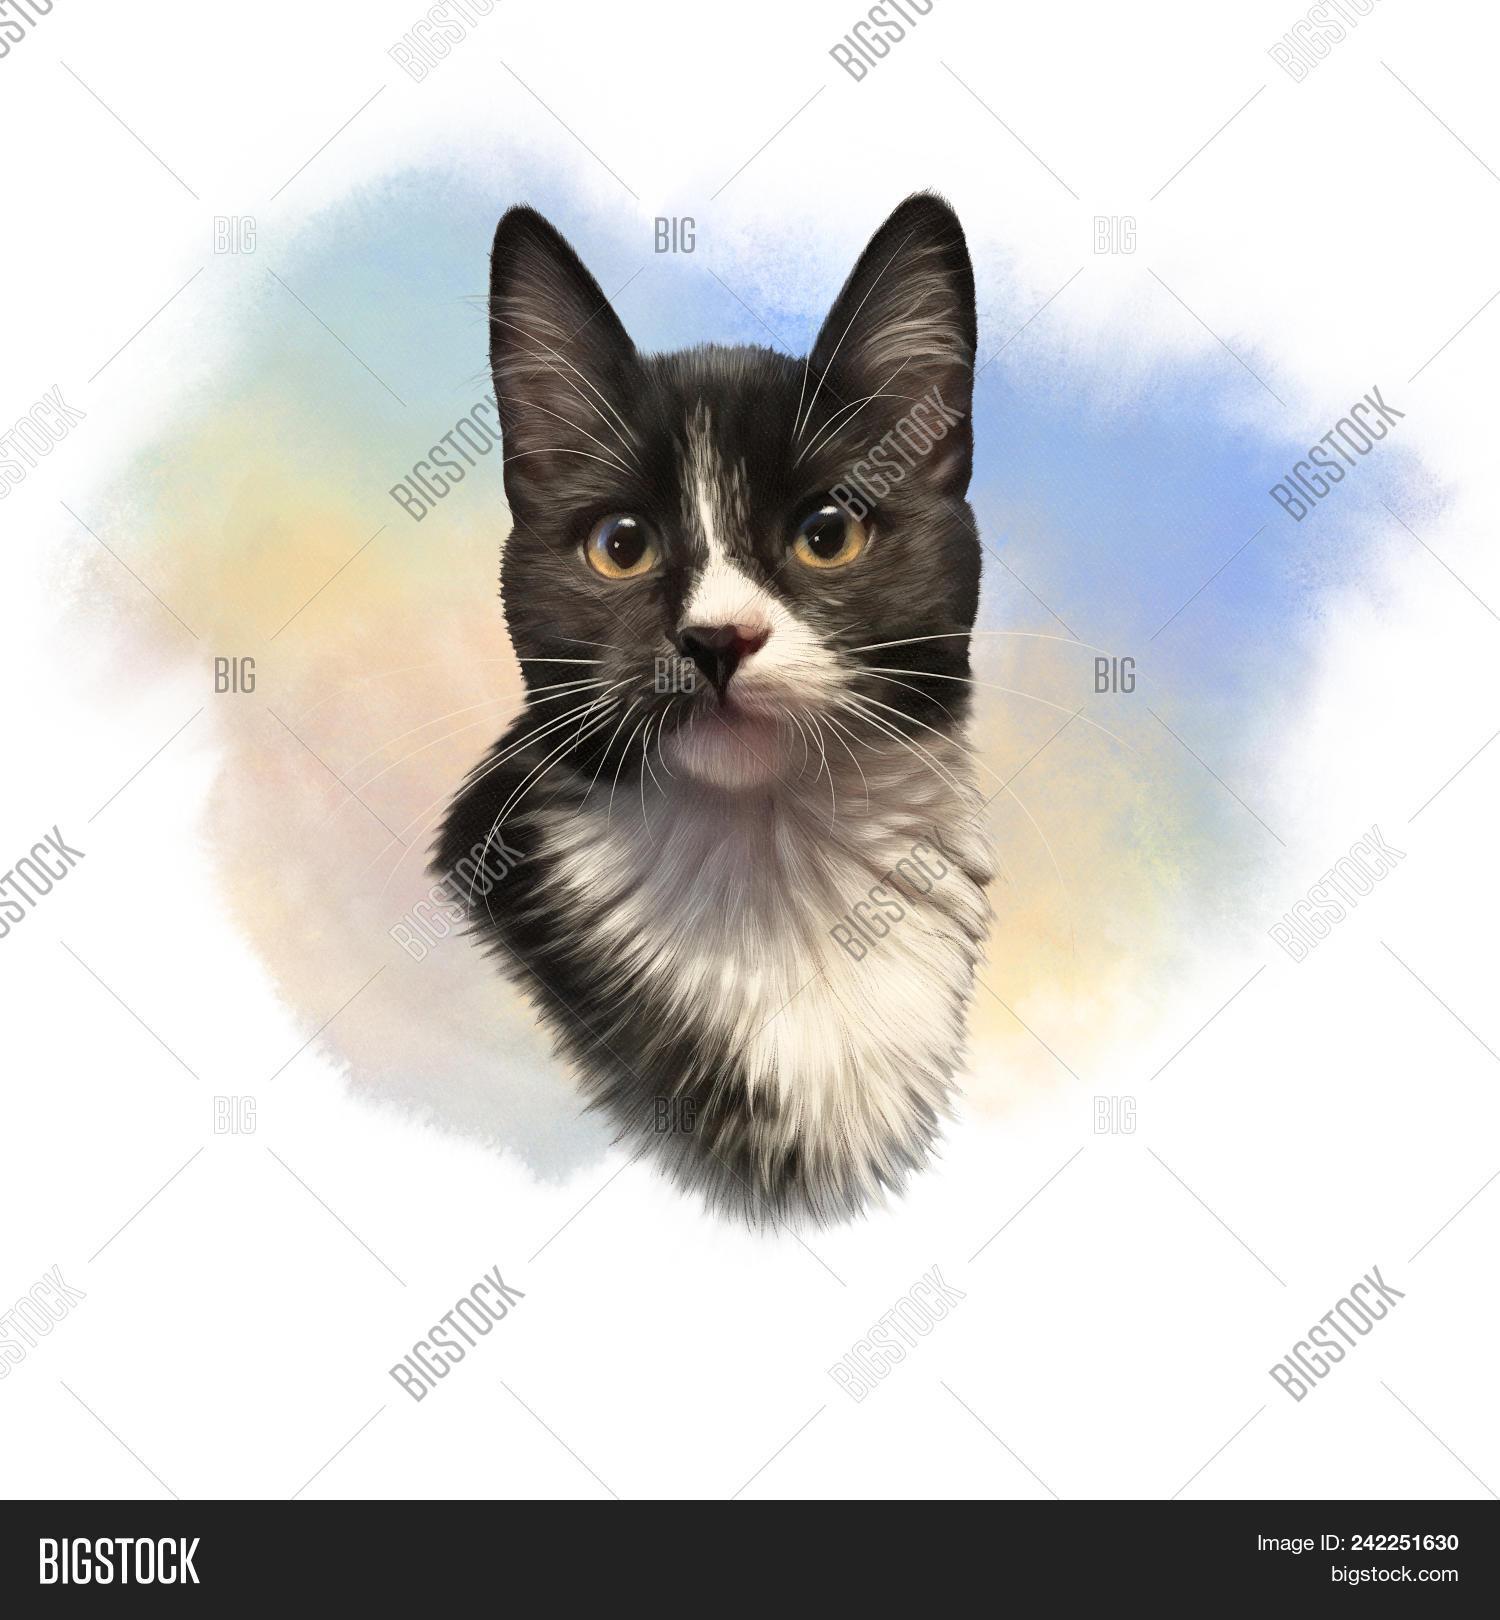 Cute Black White Cat Image Photo Free Trial Bigstock